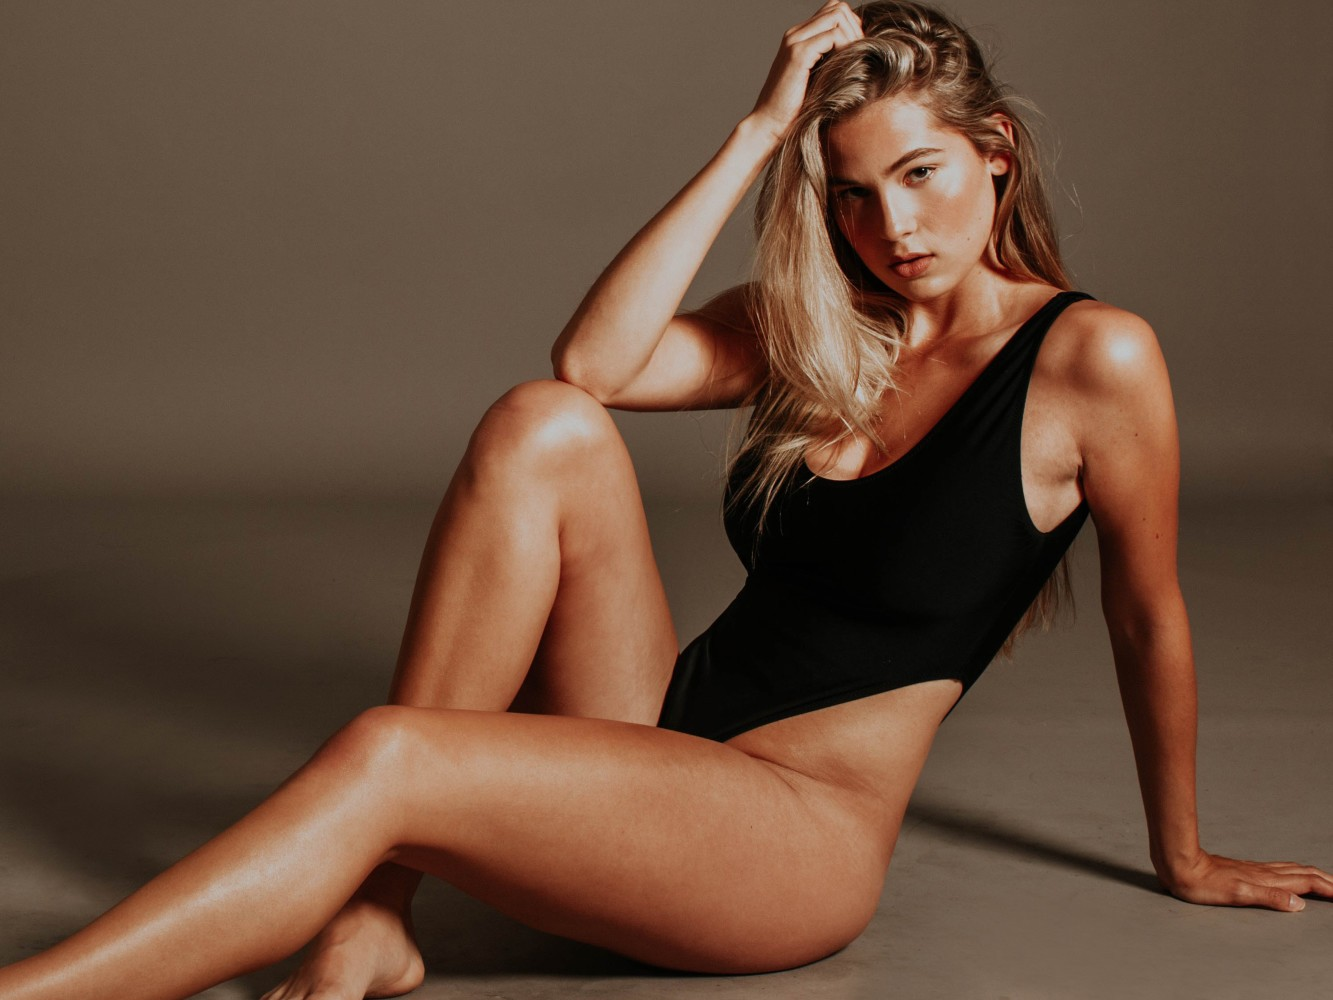 Megan nude pictures-3520